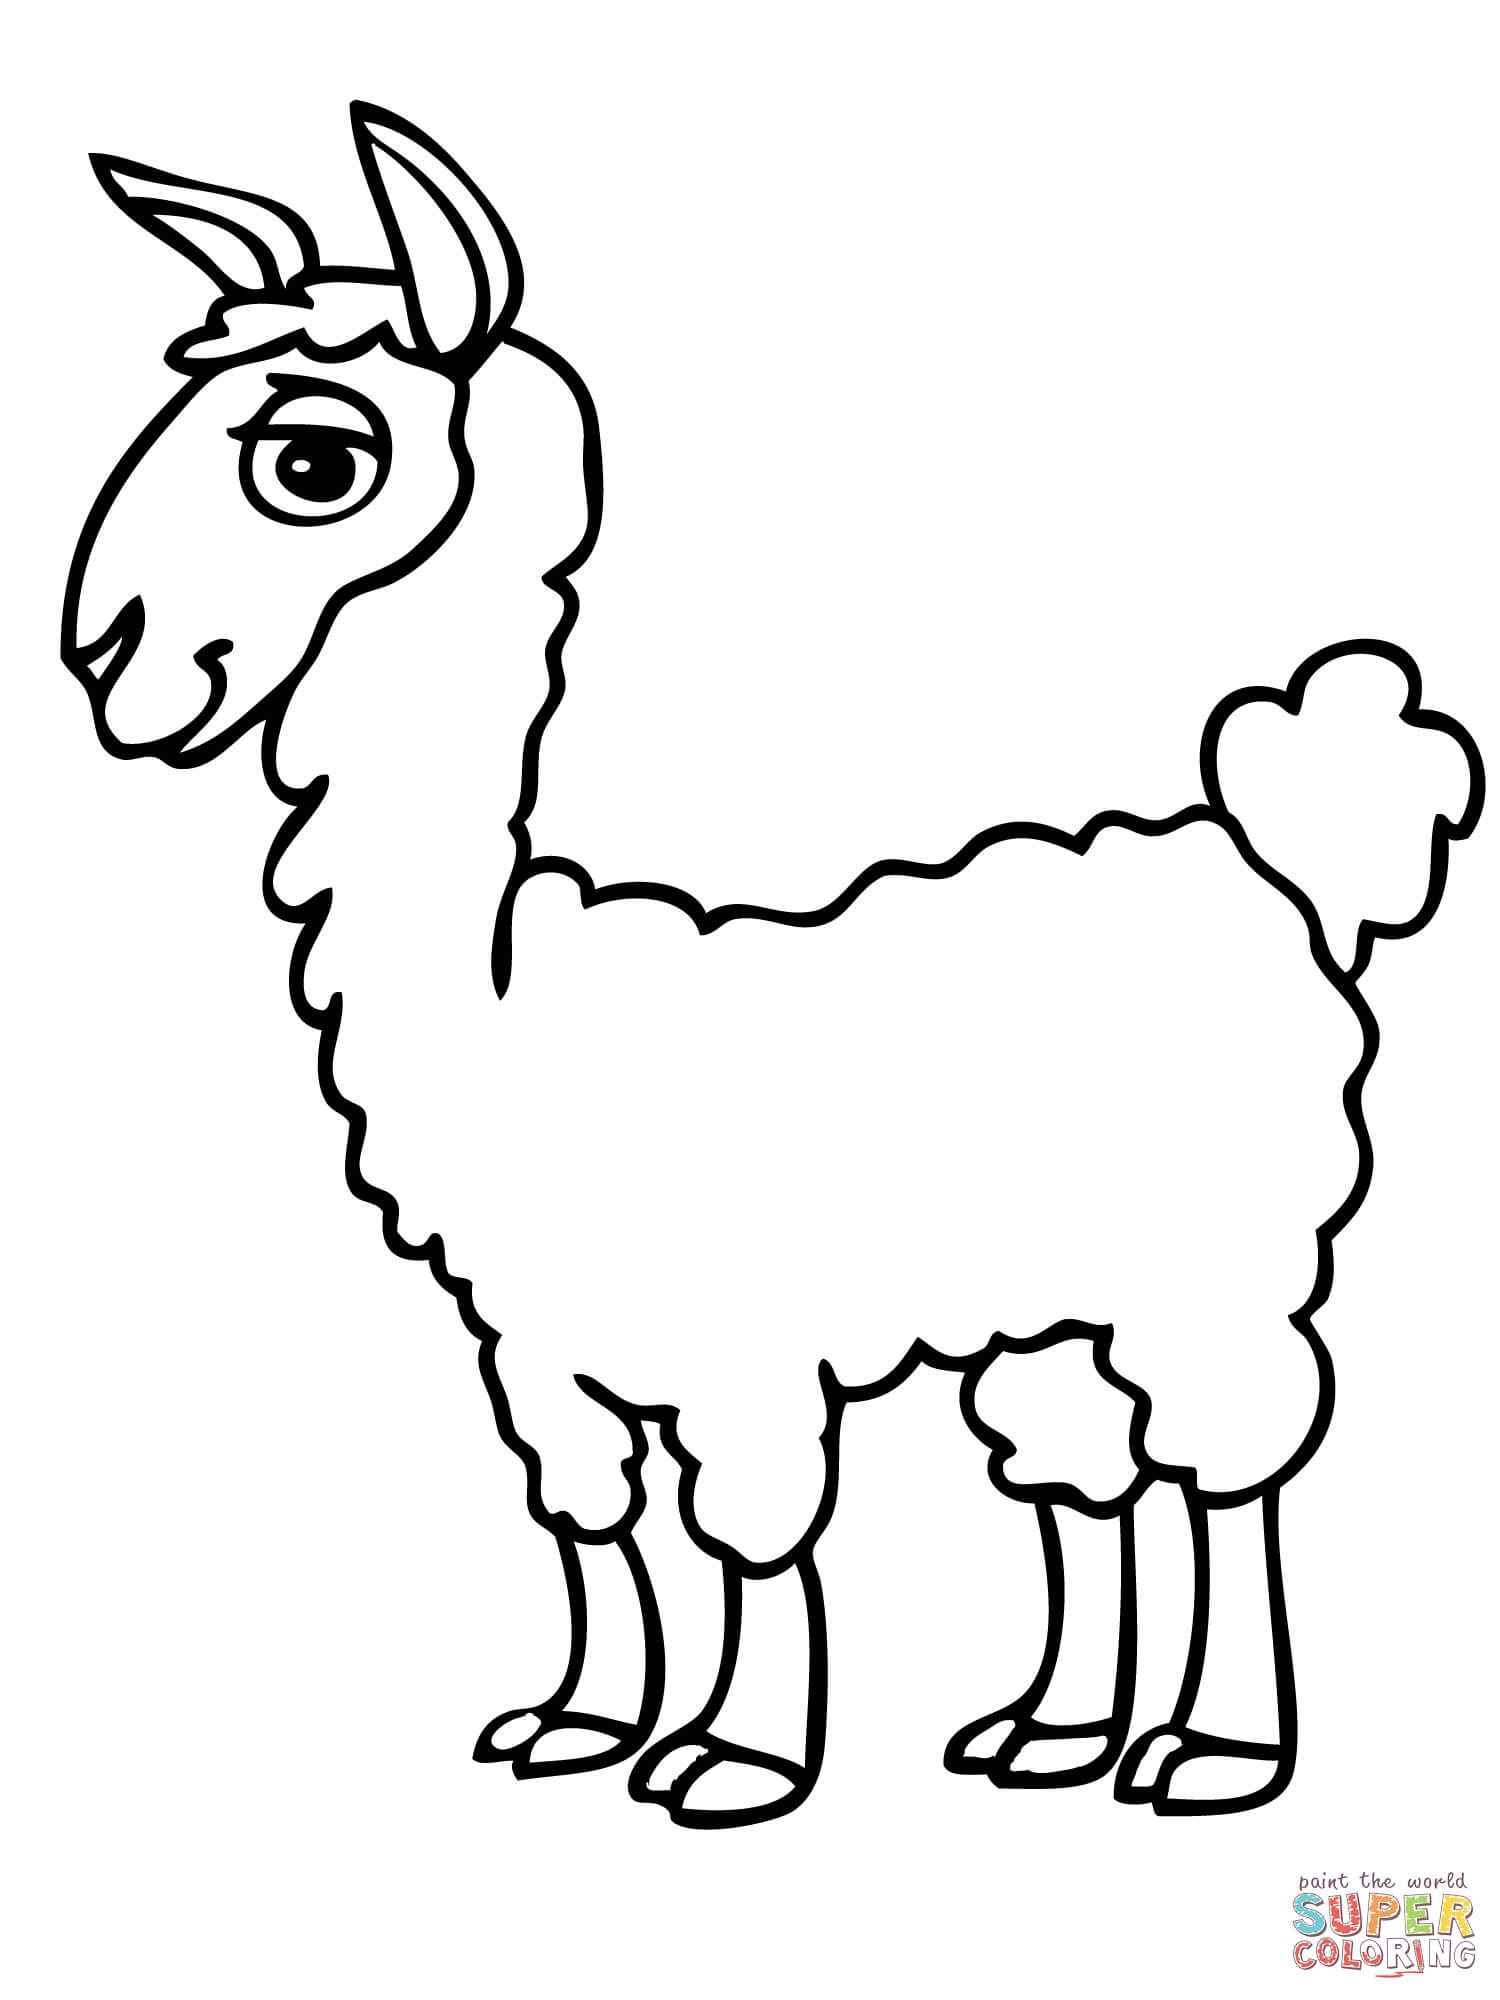 Ausmalbild Süßes Alpaka Ausmalbilder kostenlos zum